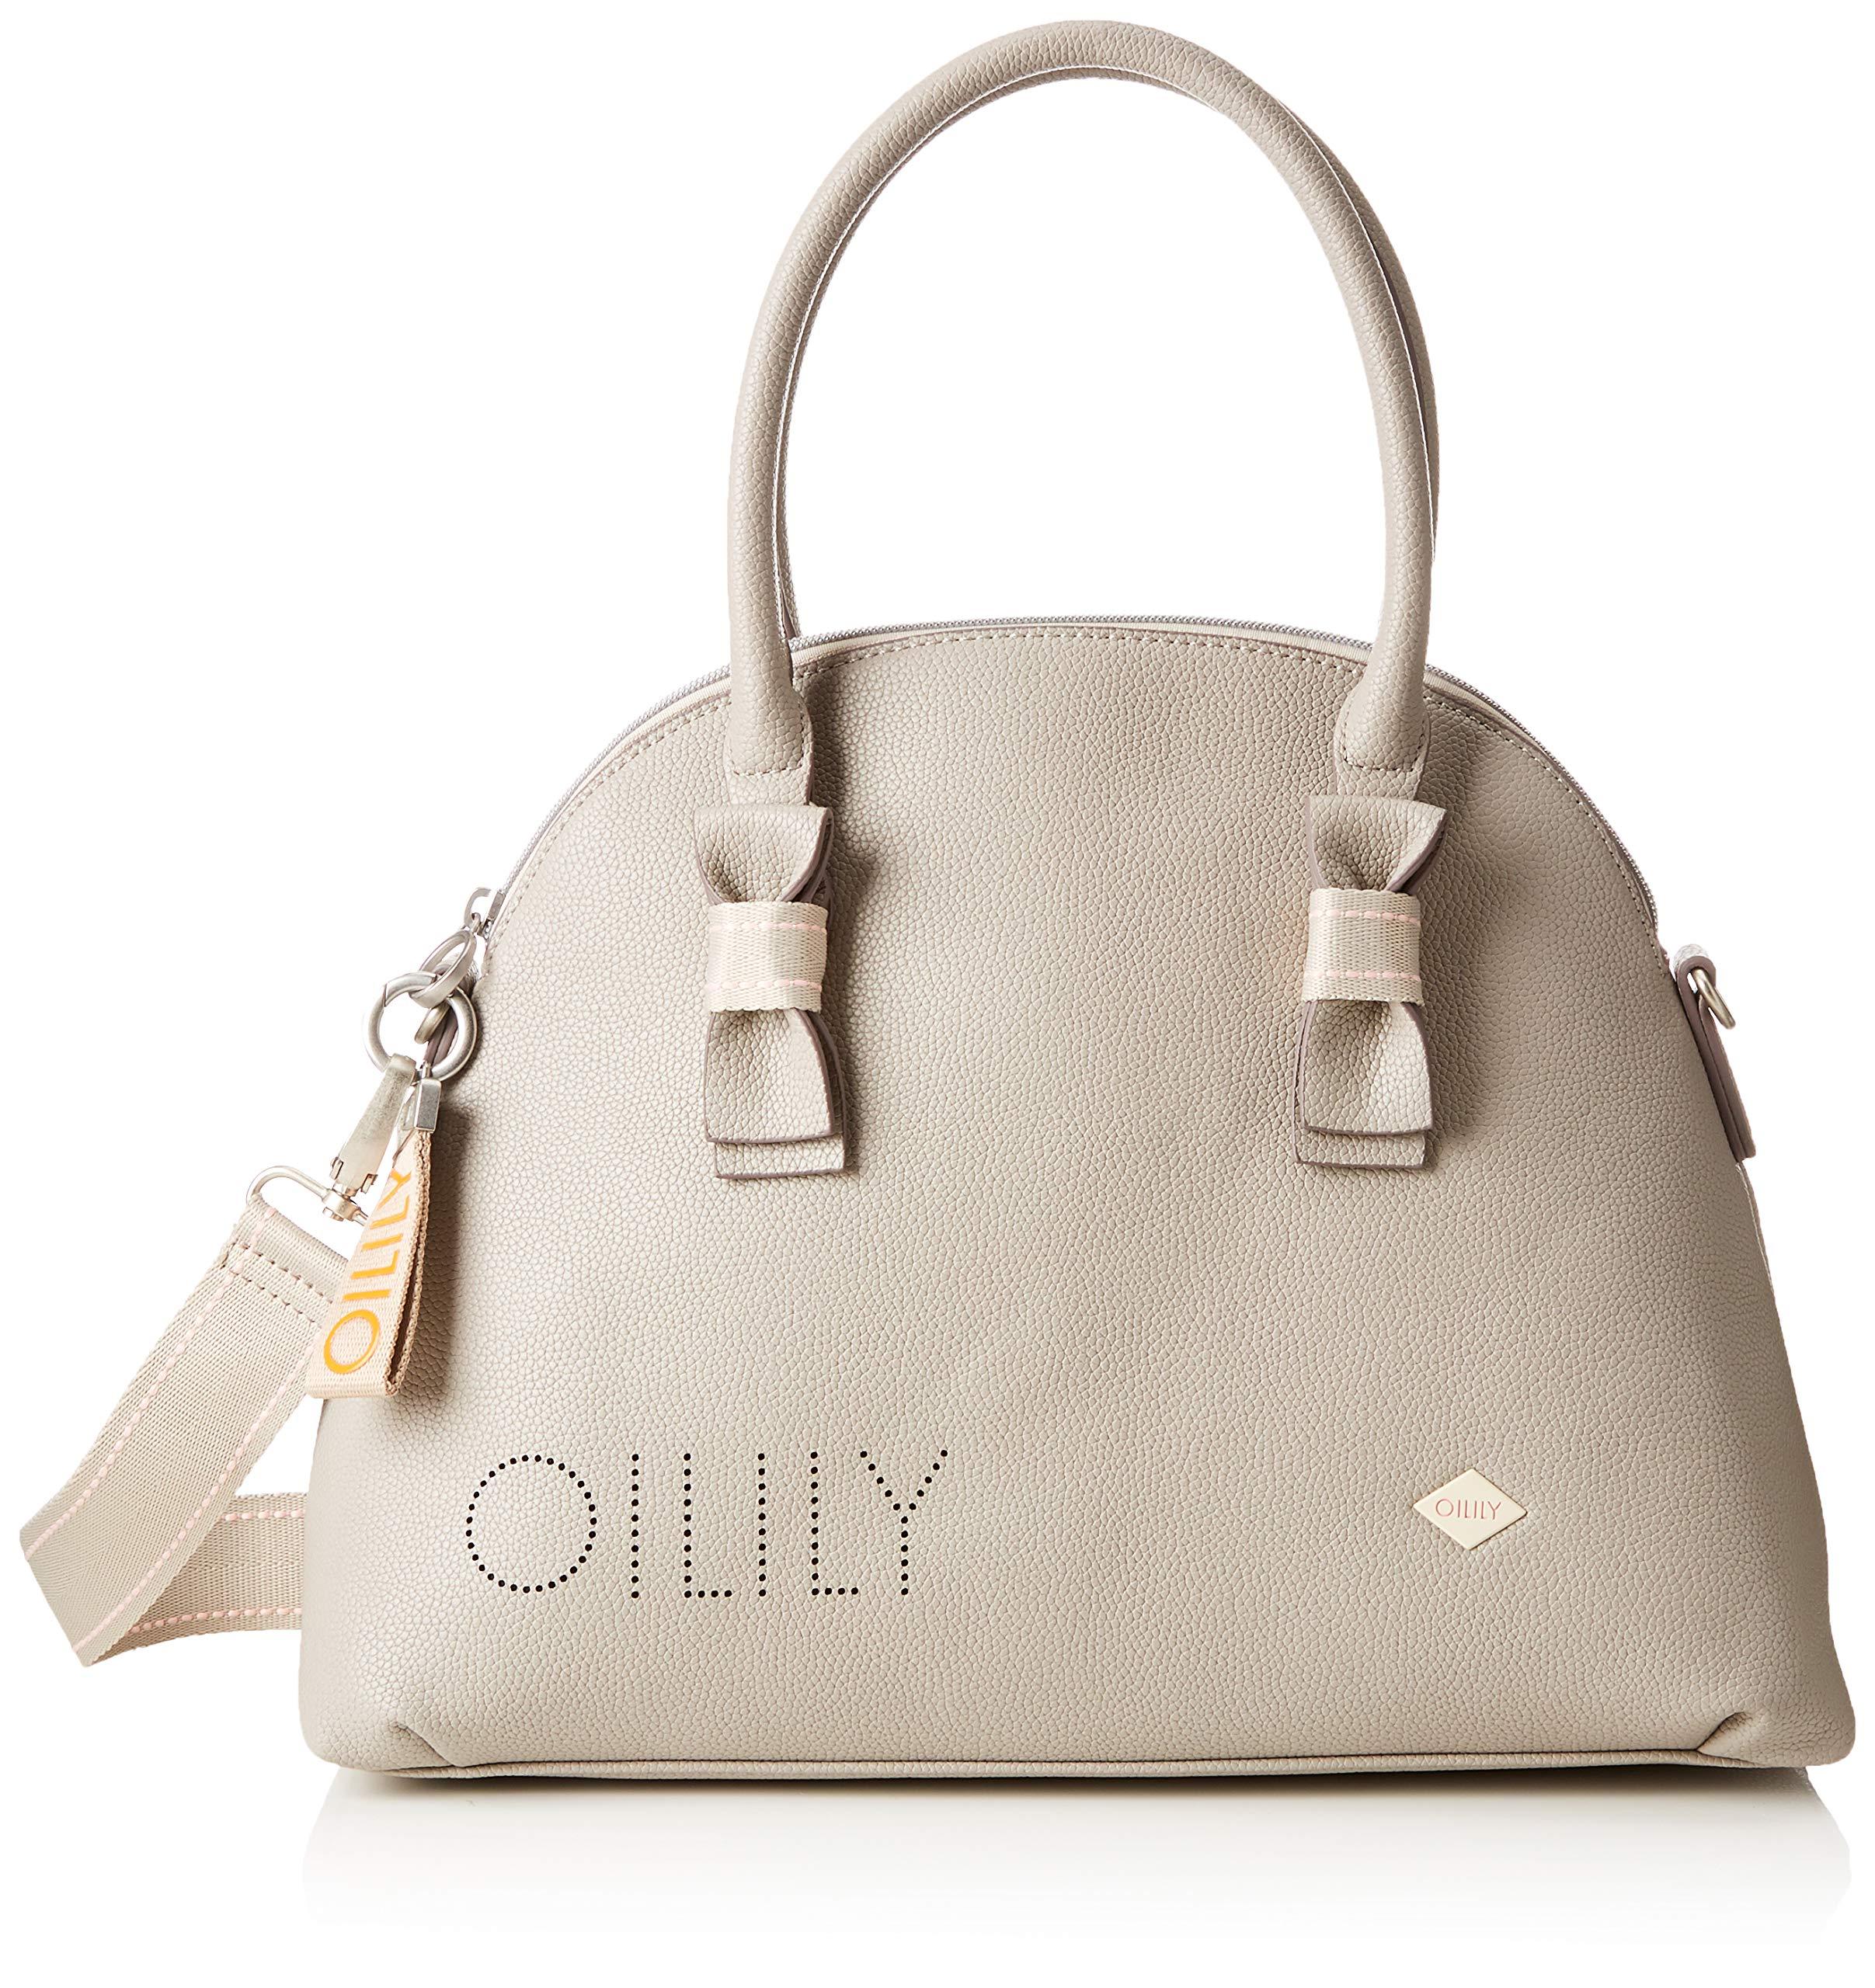 FemmeGrisgraulight Airy H X Cmb Oilily 0 T LhzCartable Grey15 0x38 Handbag 0x28 kXN80wPnO